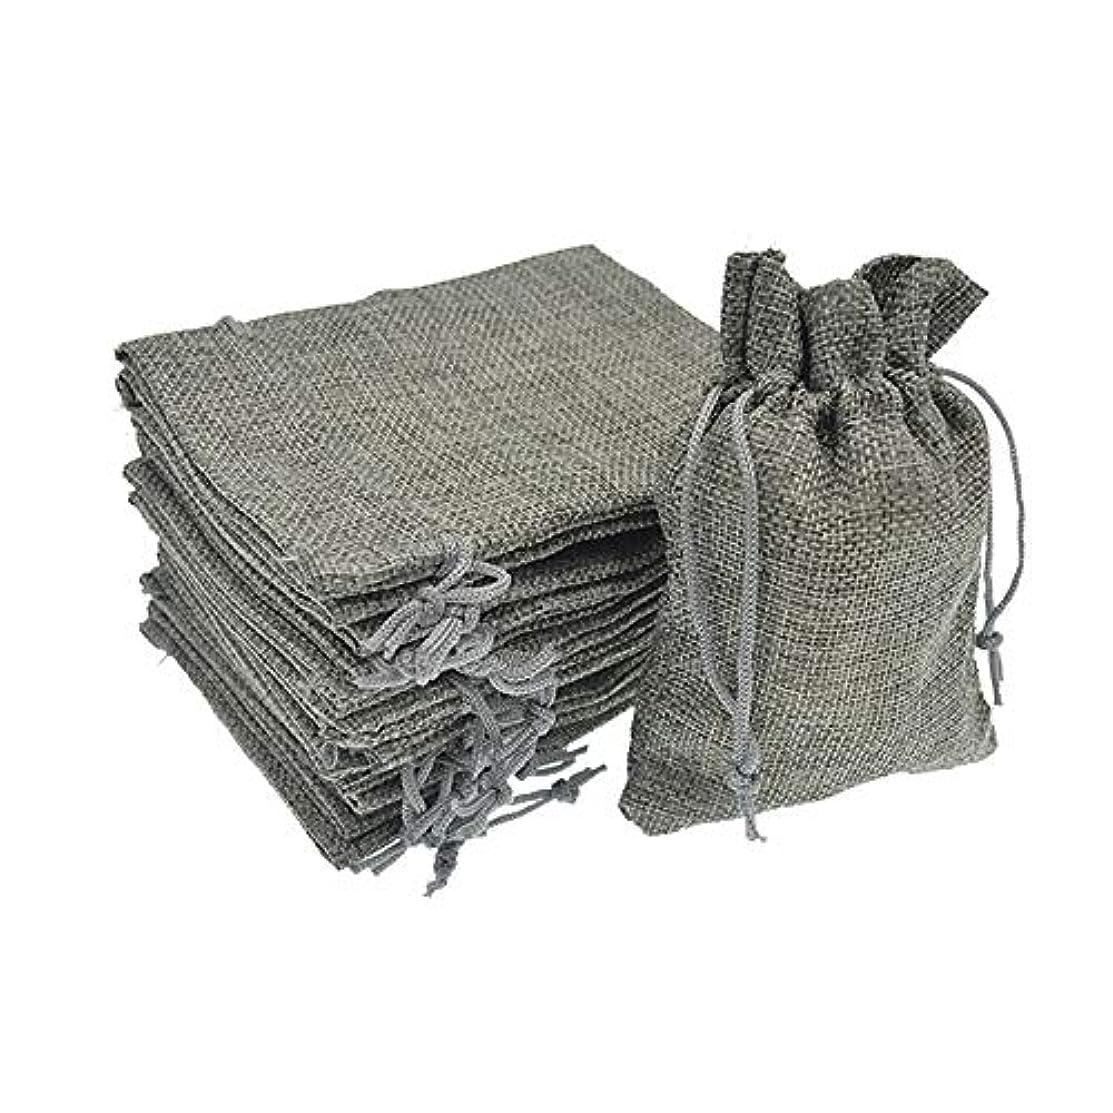 Bezall? 20pcs Drawstring Burlap Jute Sacks Jewelry Candy Pouch Christmas Wedding Party Favor Gift Bags (Gray, 2.7 x 3.5